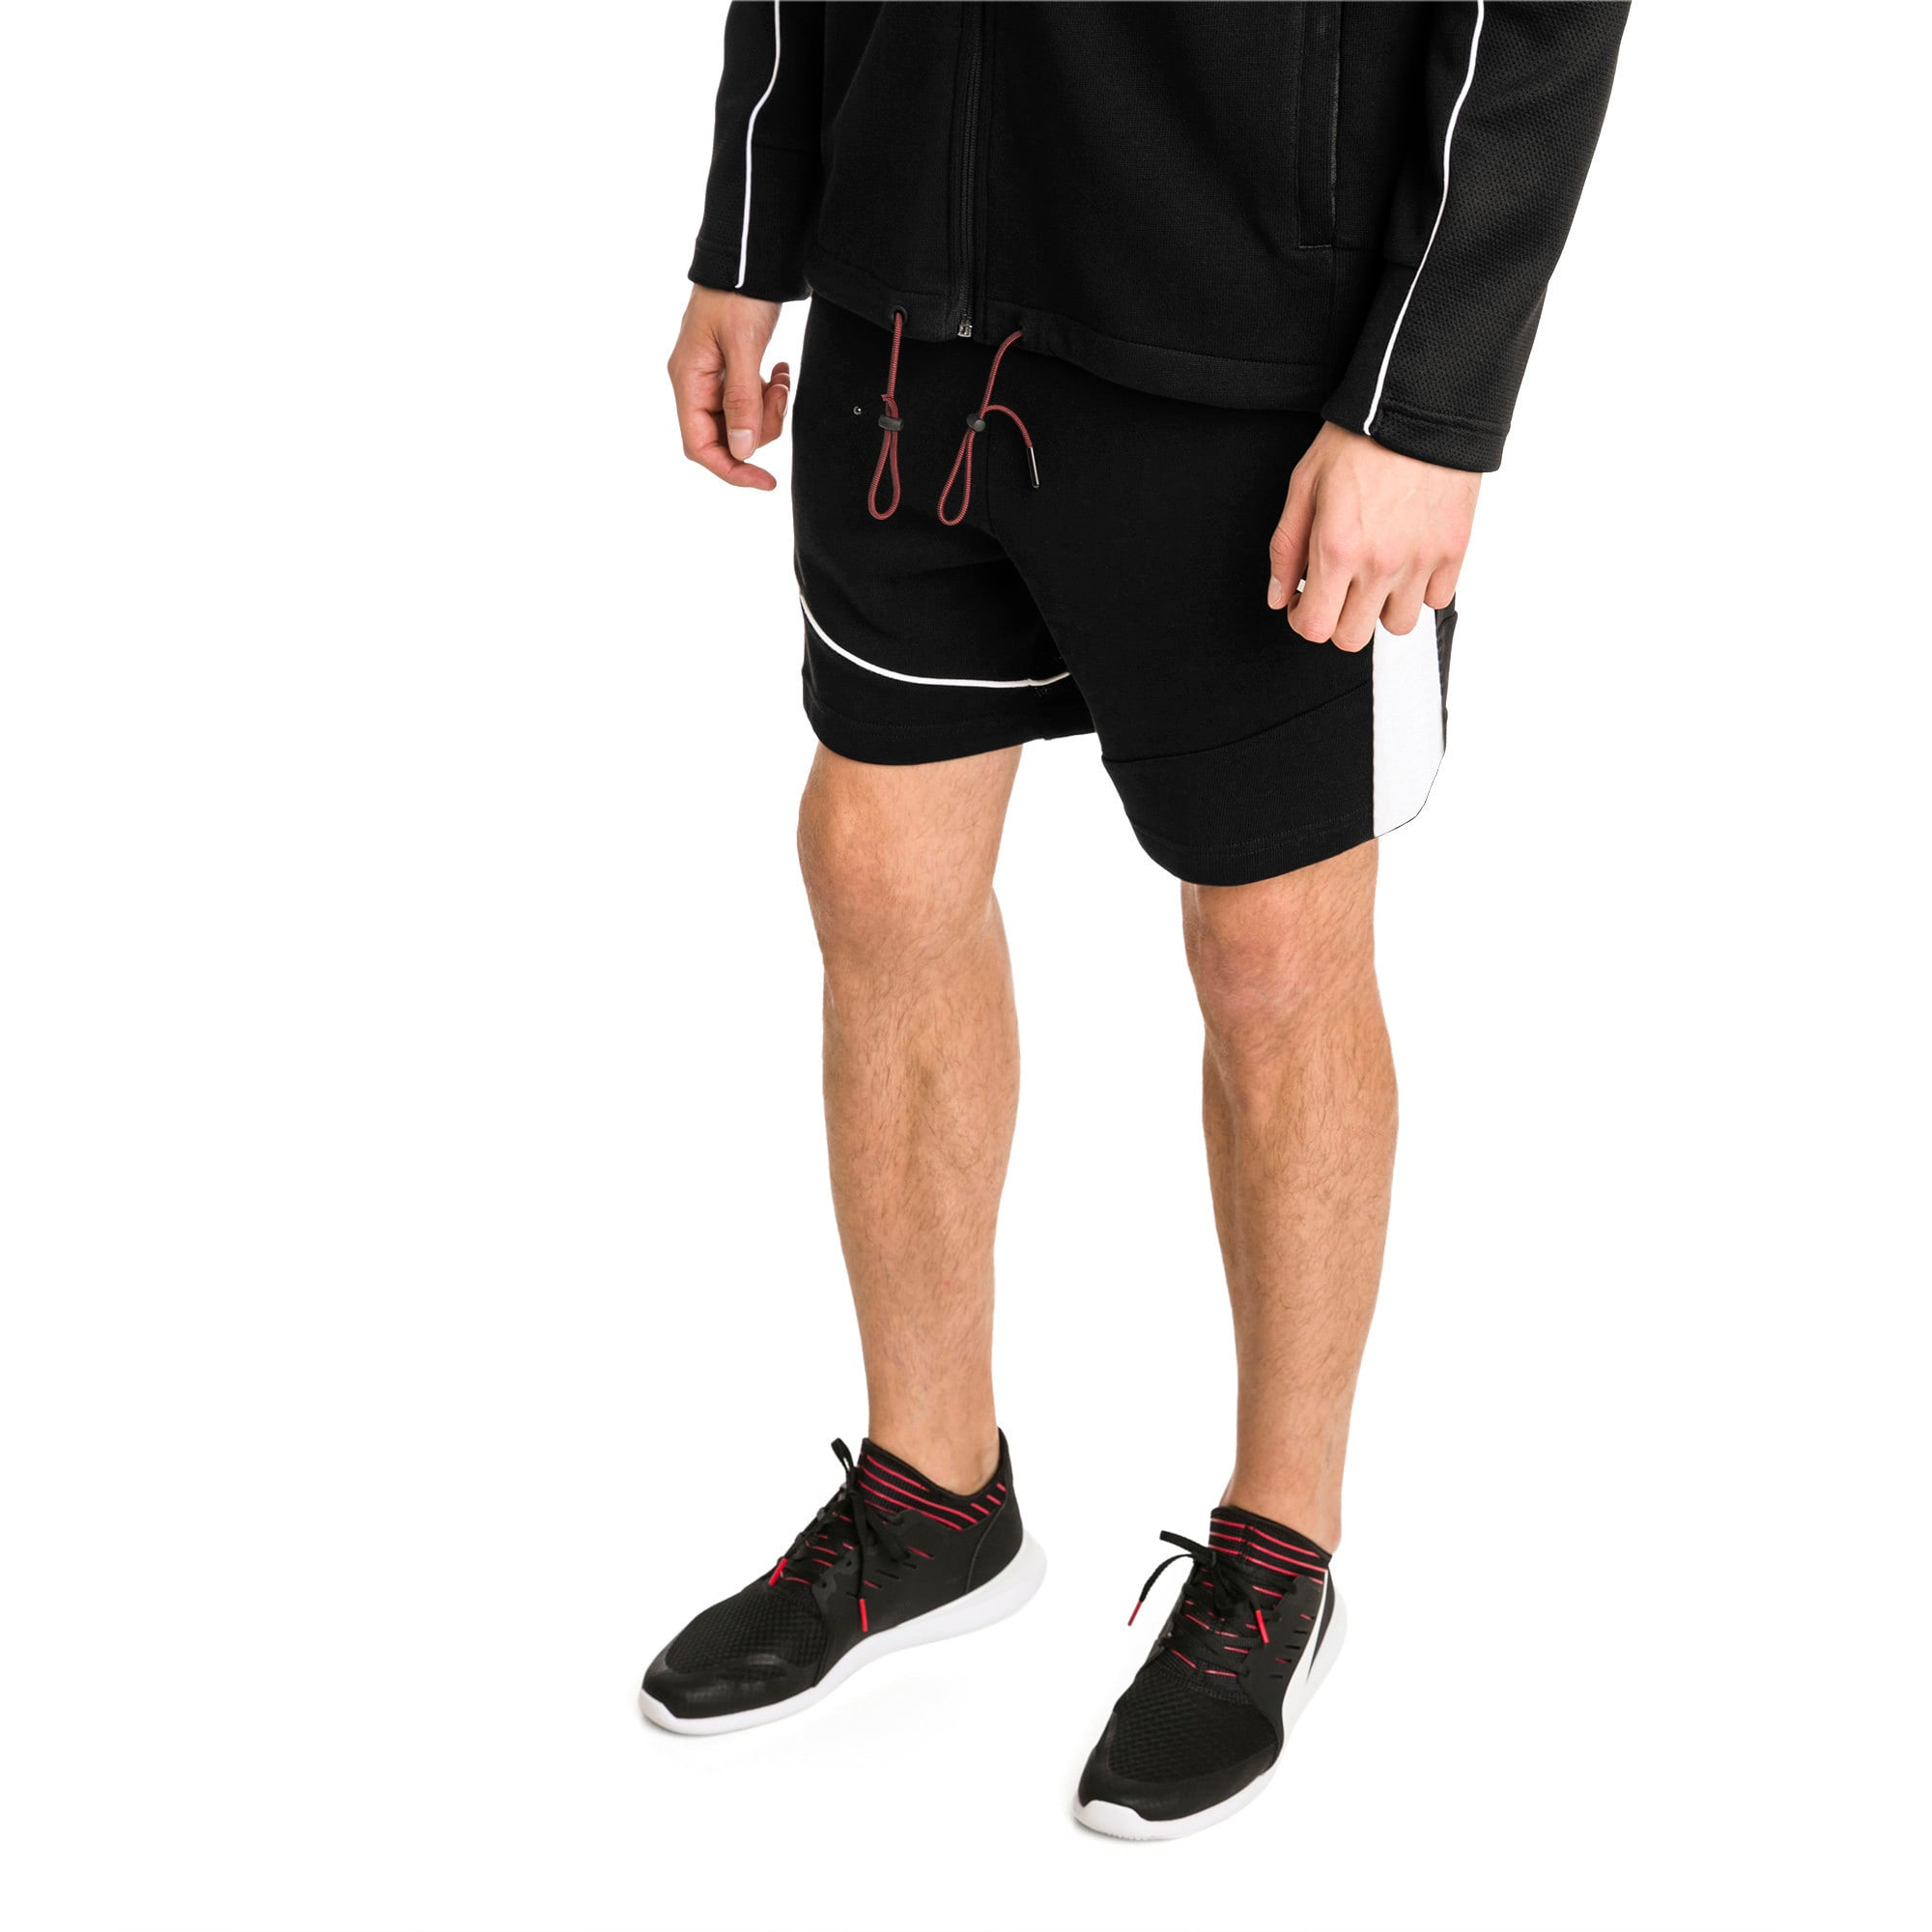 Thumbnail 1 of Ferrari Men's Sweat Shorts, Puma Black, medium-IND